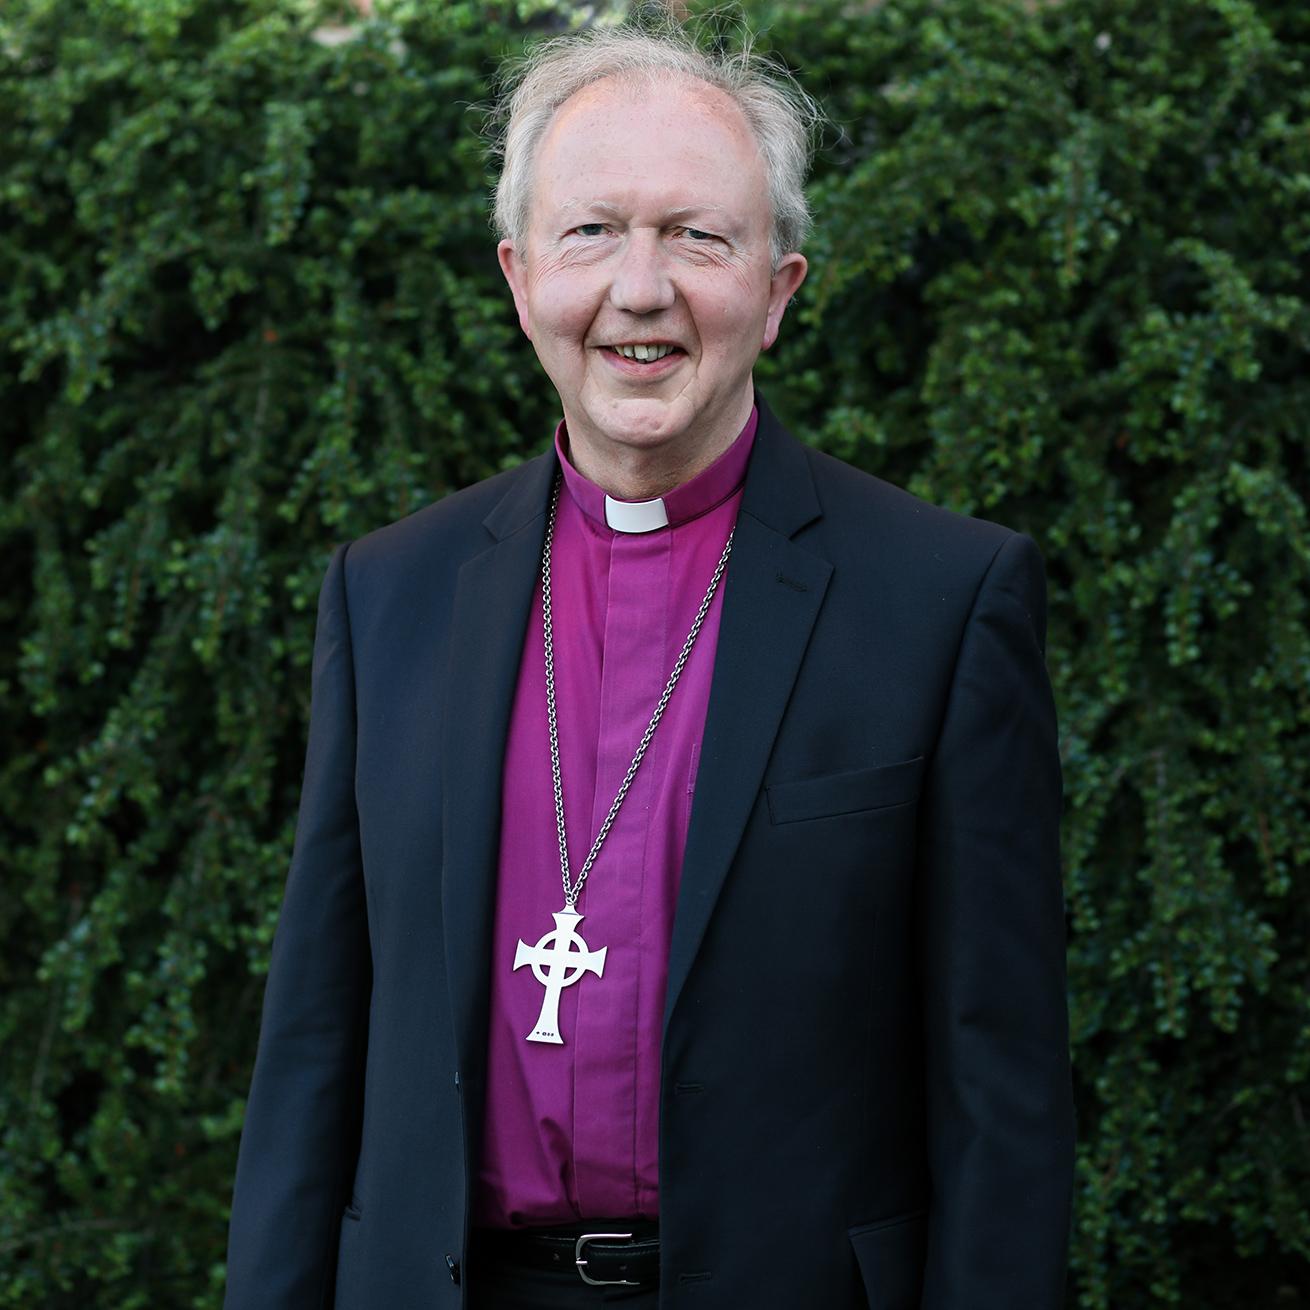 Bishop James Bell